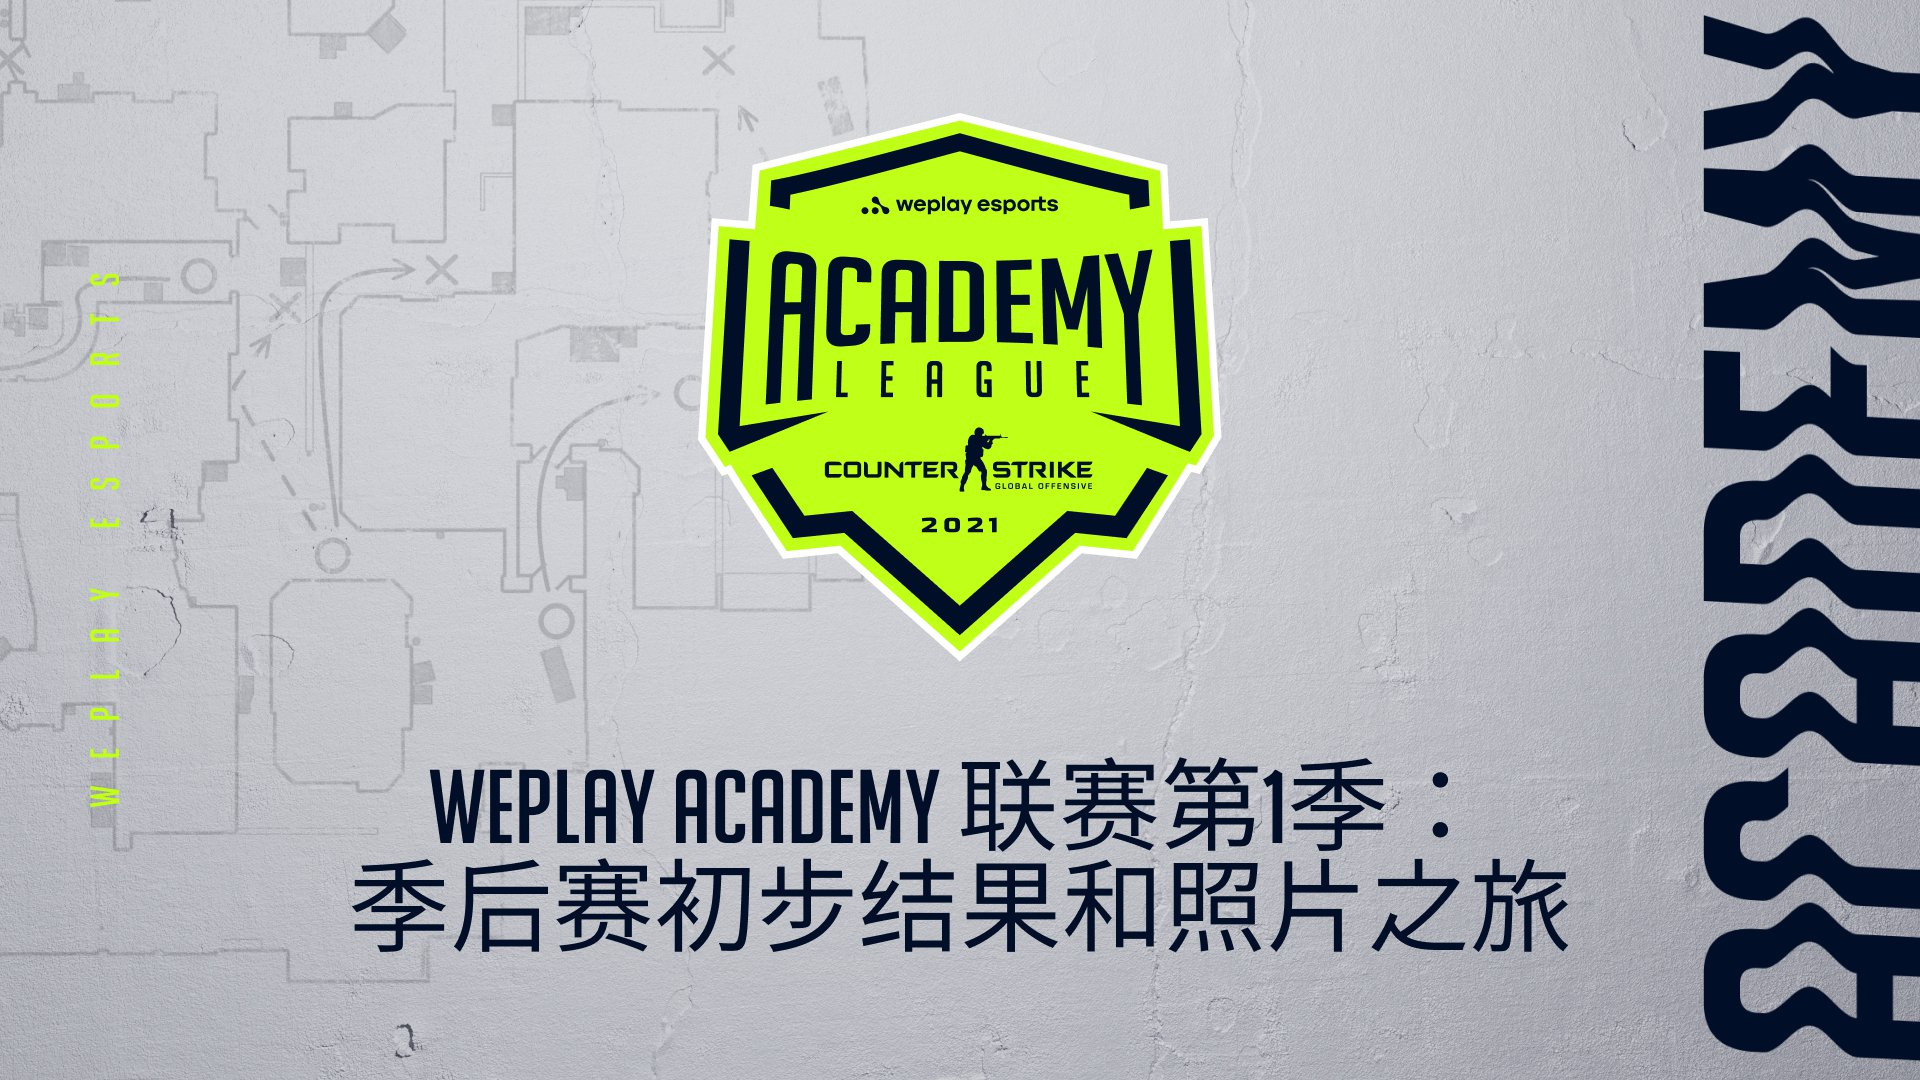 WePlay Academy 联赛第1季:季后赛初步结果和照片之旅。 图像:WePlay Holding